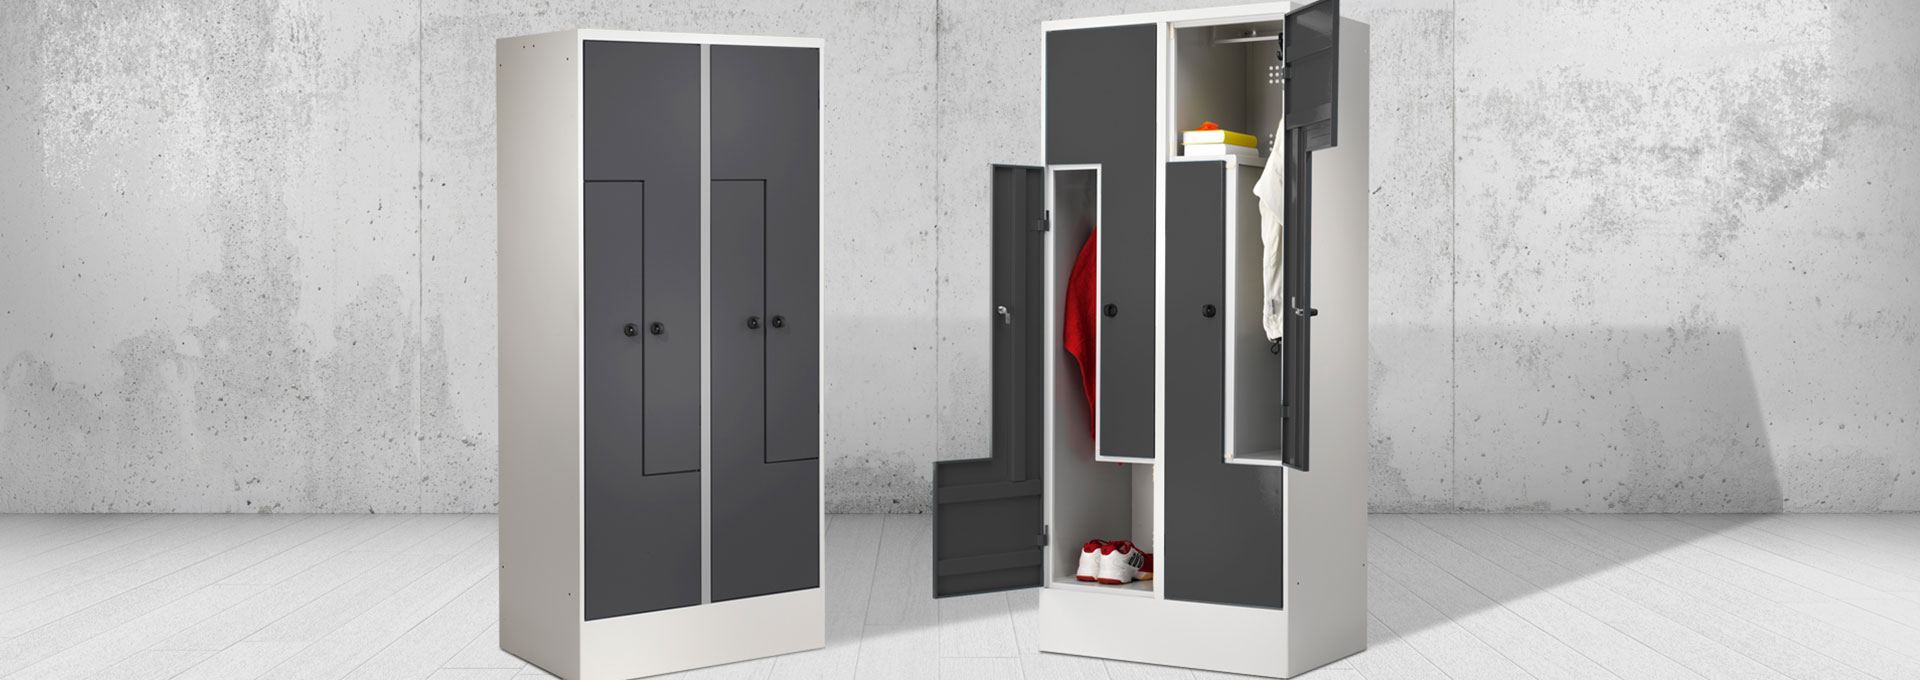 Schranksysteme-Garderobenschrank-kompakt-komfortabel-Z-GZ-mauser-sliderMPogmIALuJuoY